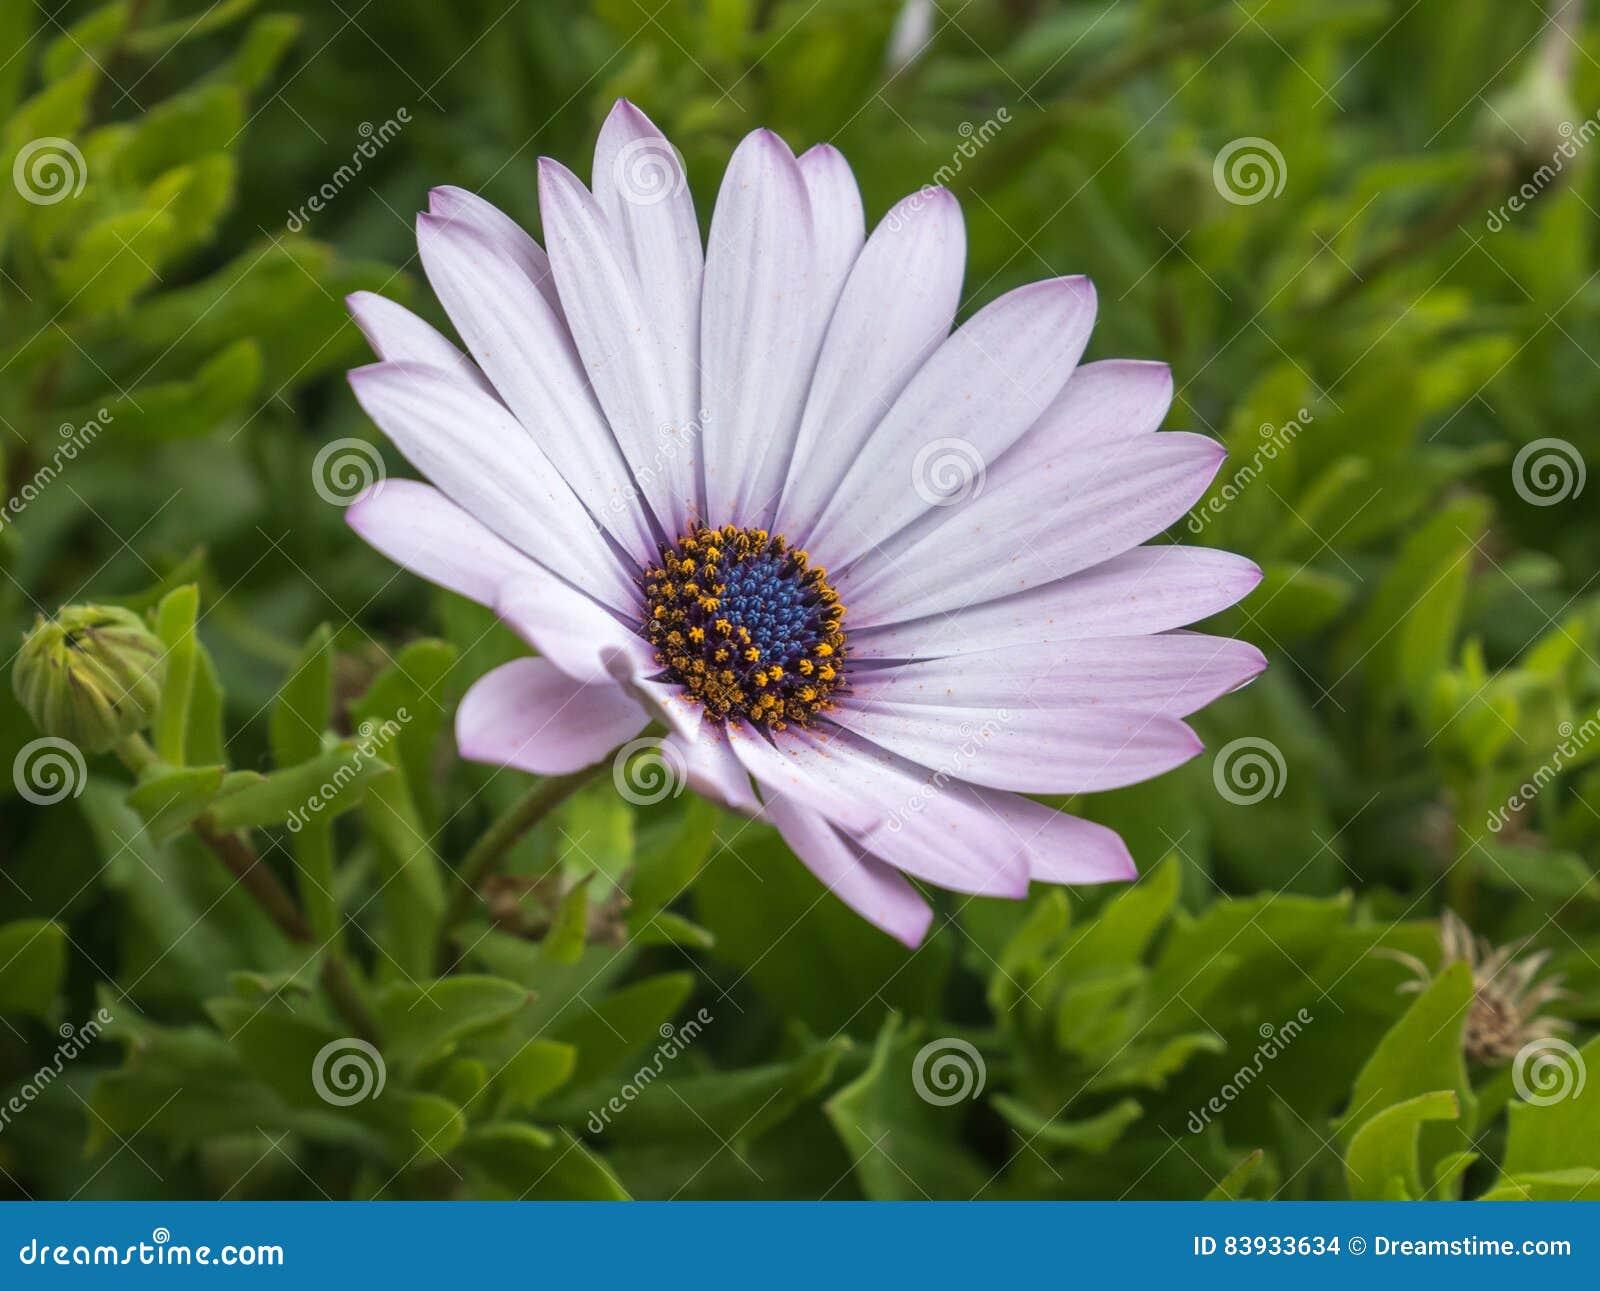 Single osteospermum flower in the garden african daisy stock photo white pinkish daisy flower with blue center green leaves closeup izmirmasajfo